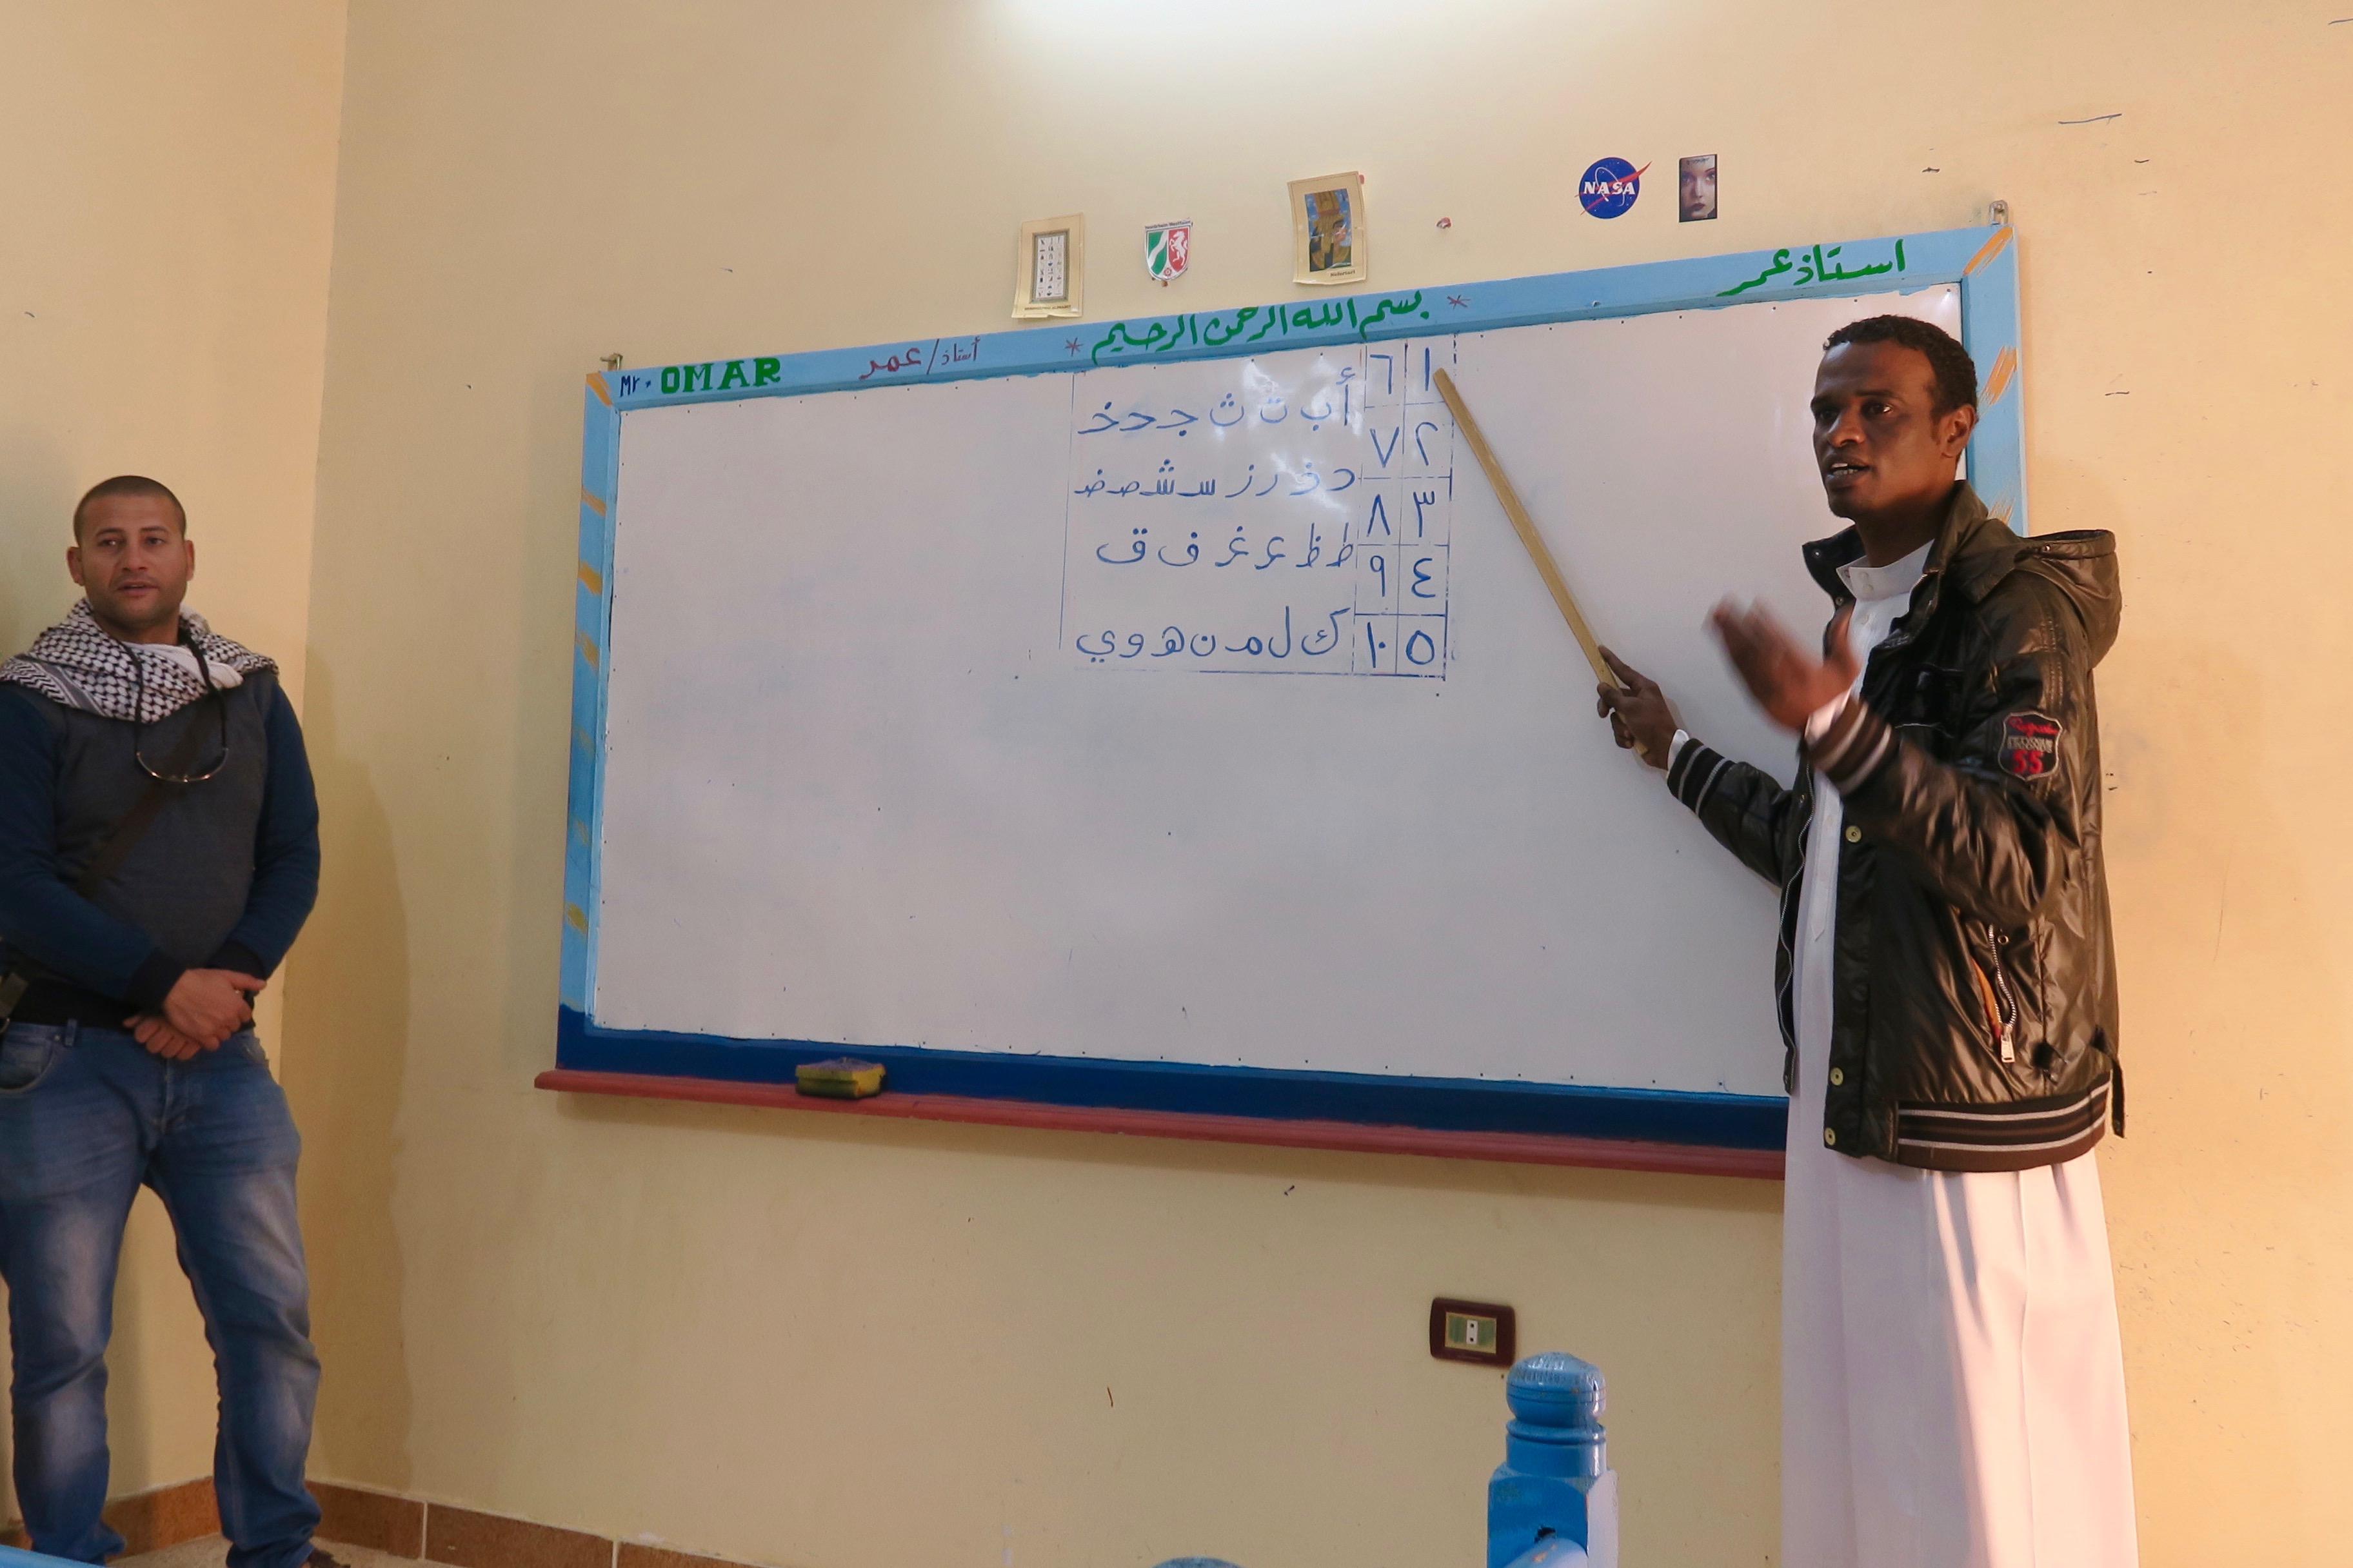 Mr. Omar, Nubian Teacher